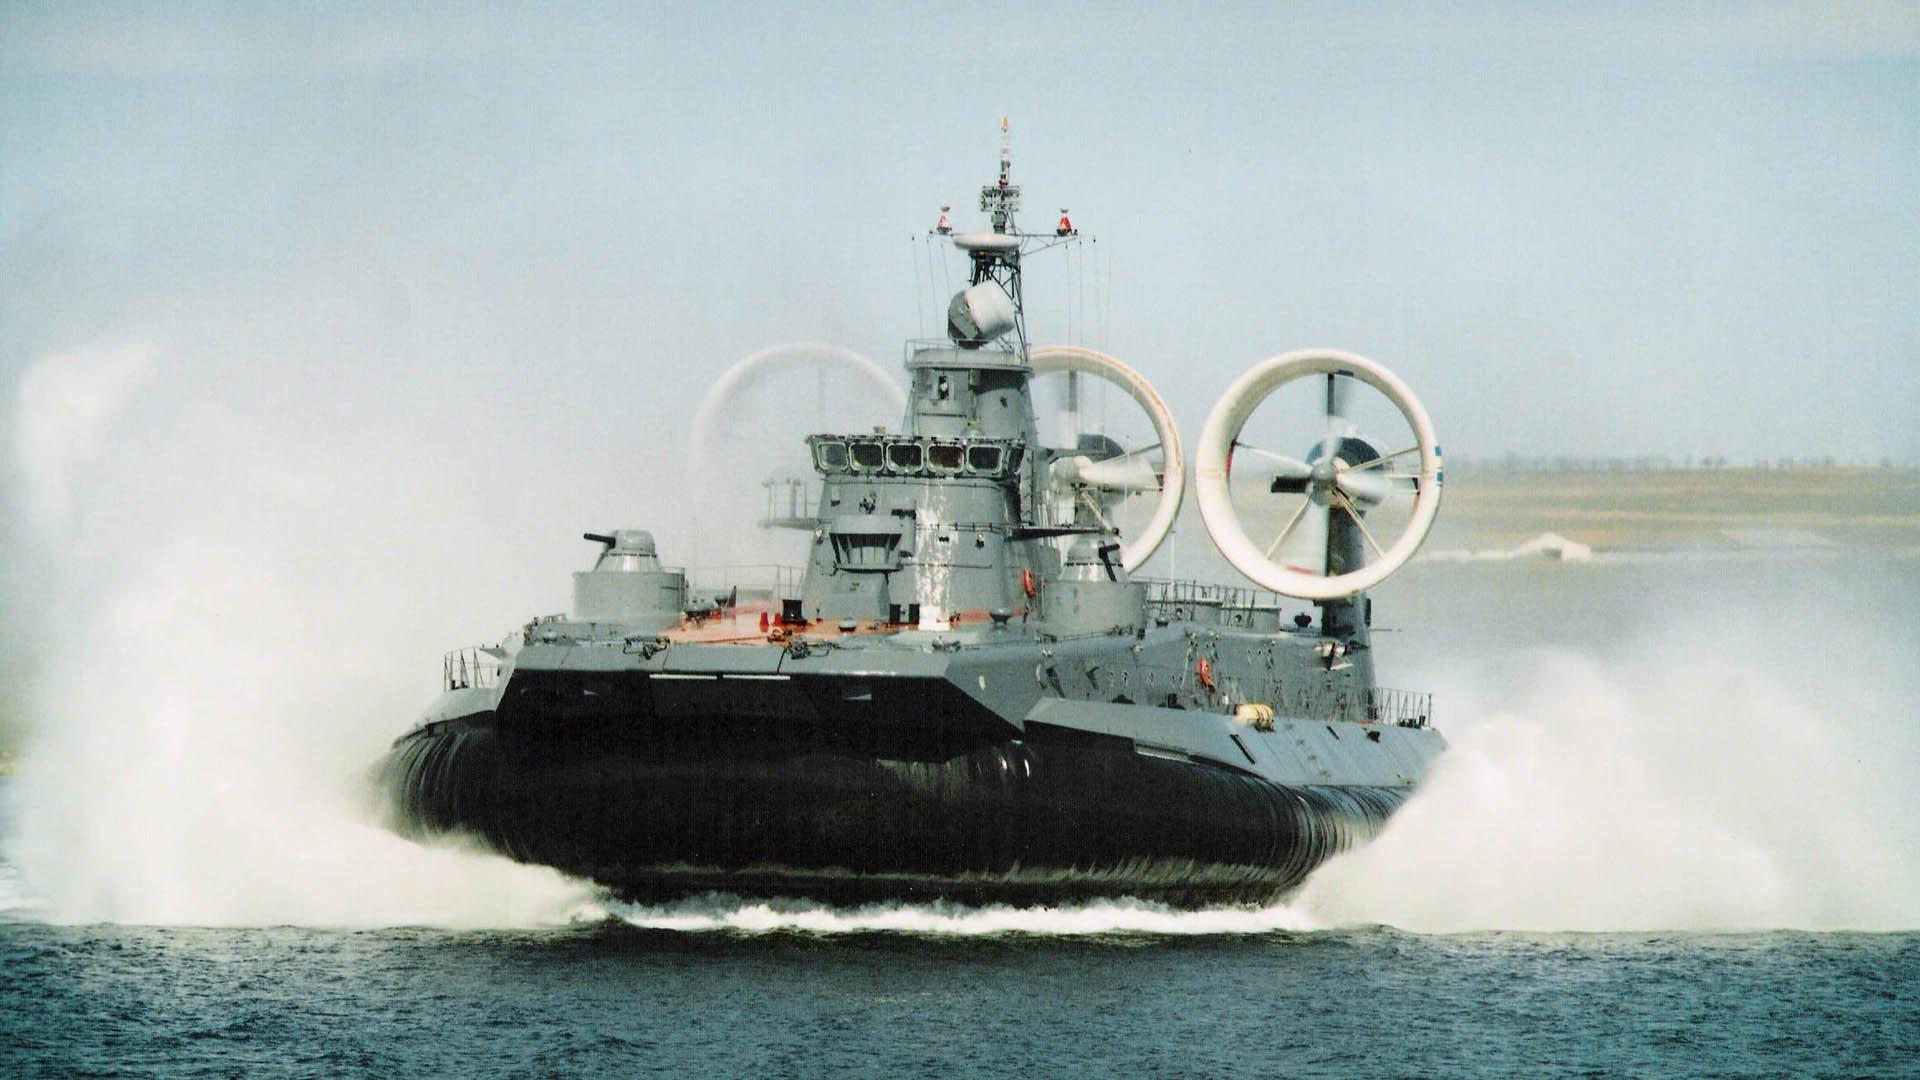 navy wallpaper 1440x900 ships - photo #44